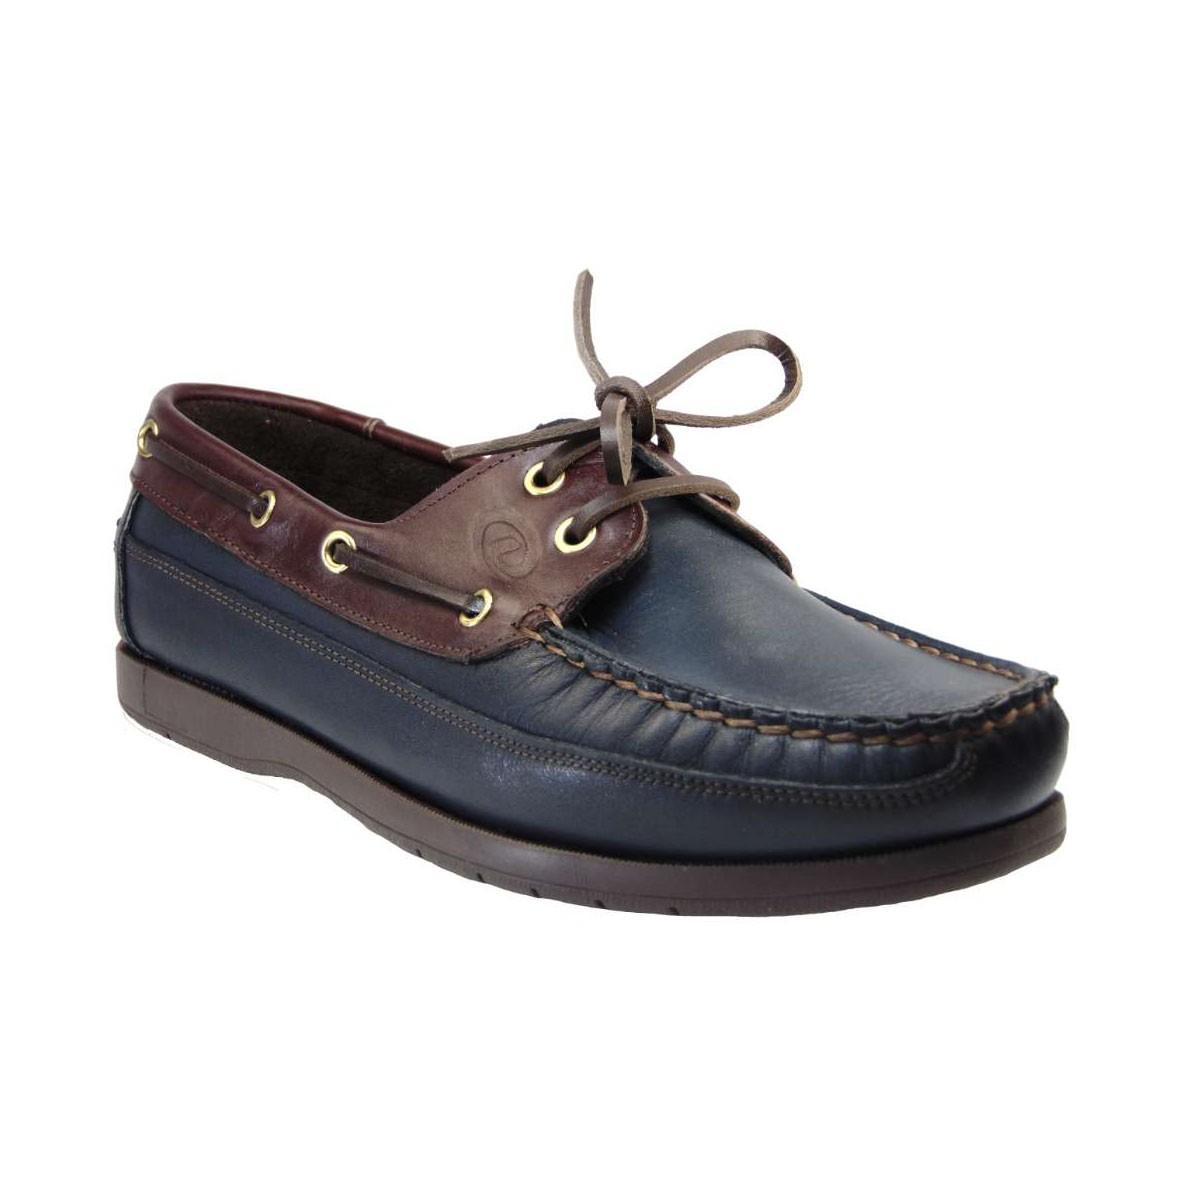 Vantagio 813 Boat Shoe Απο Γνήσιο Δέρμα Μπλε